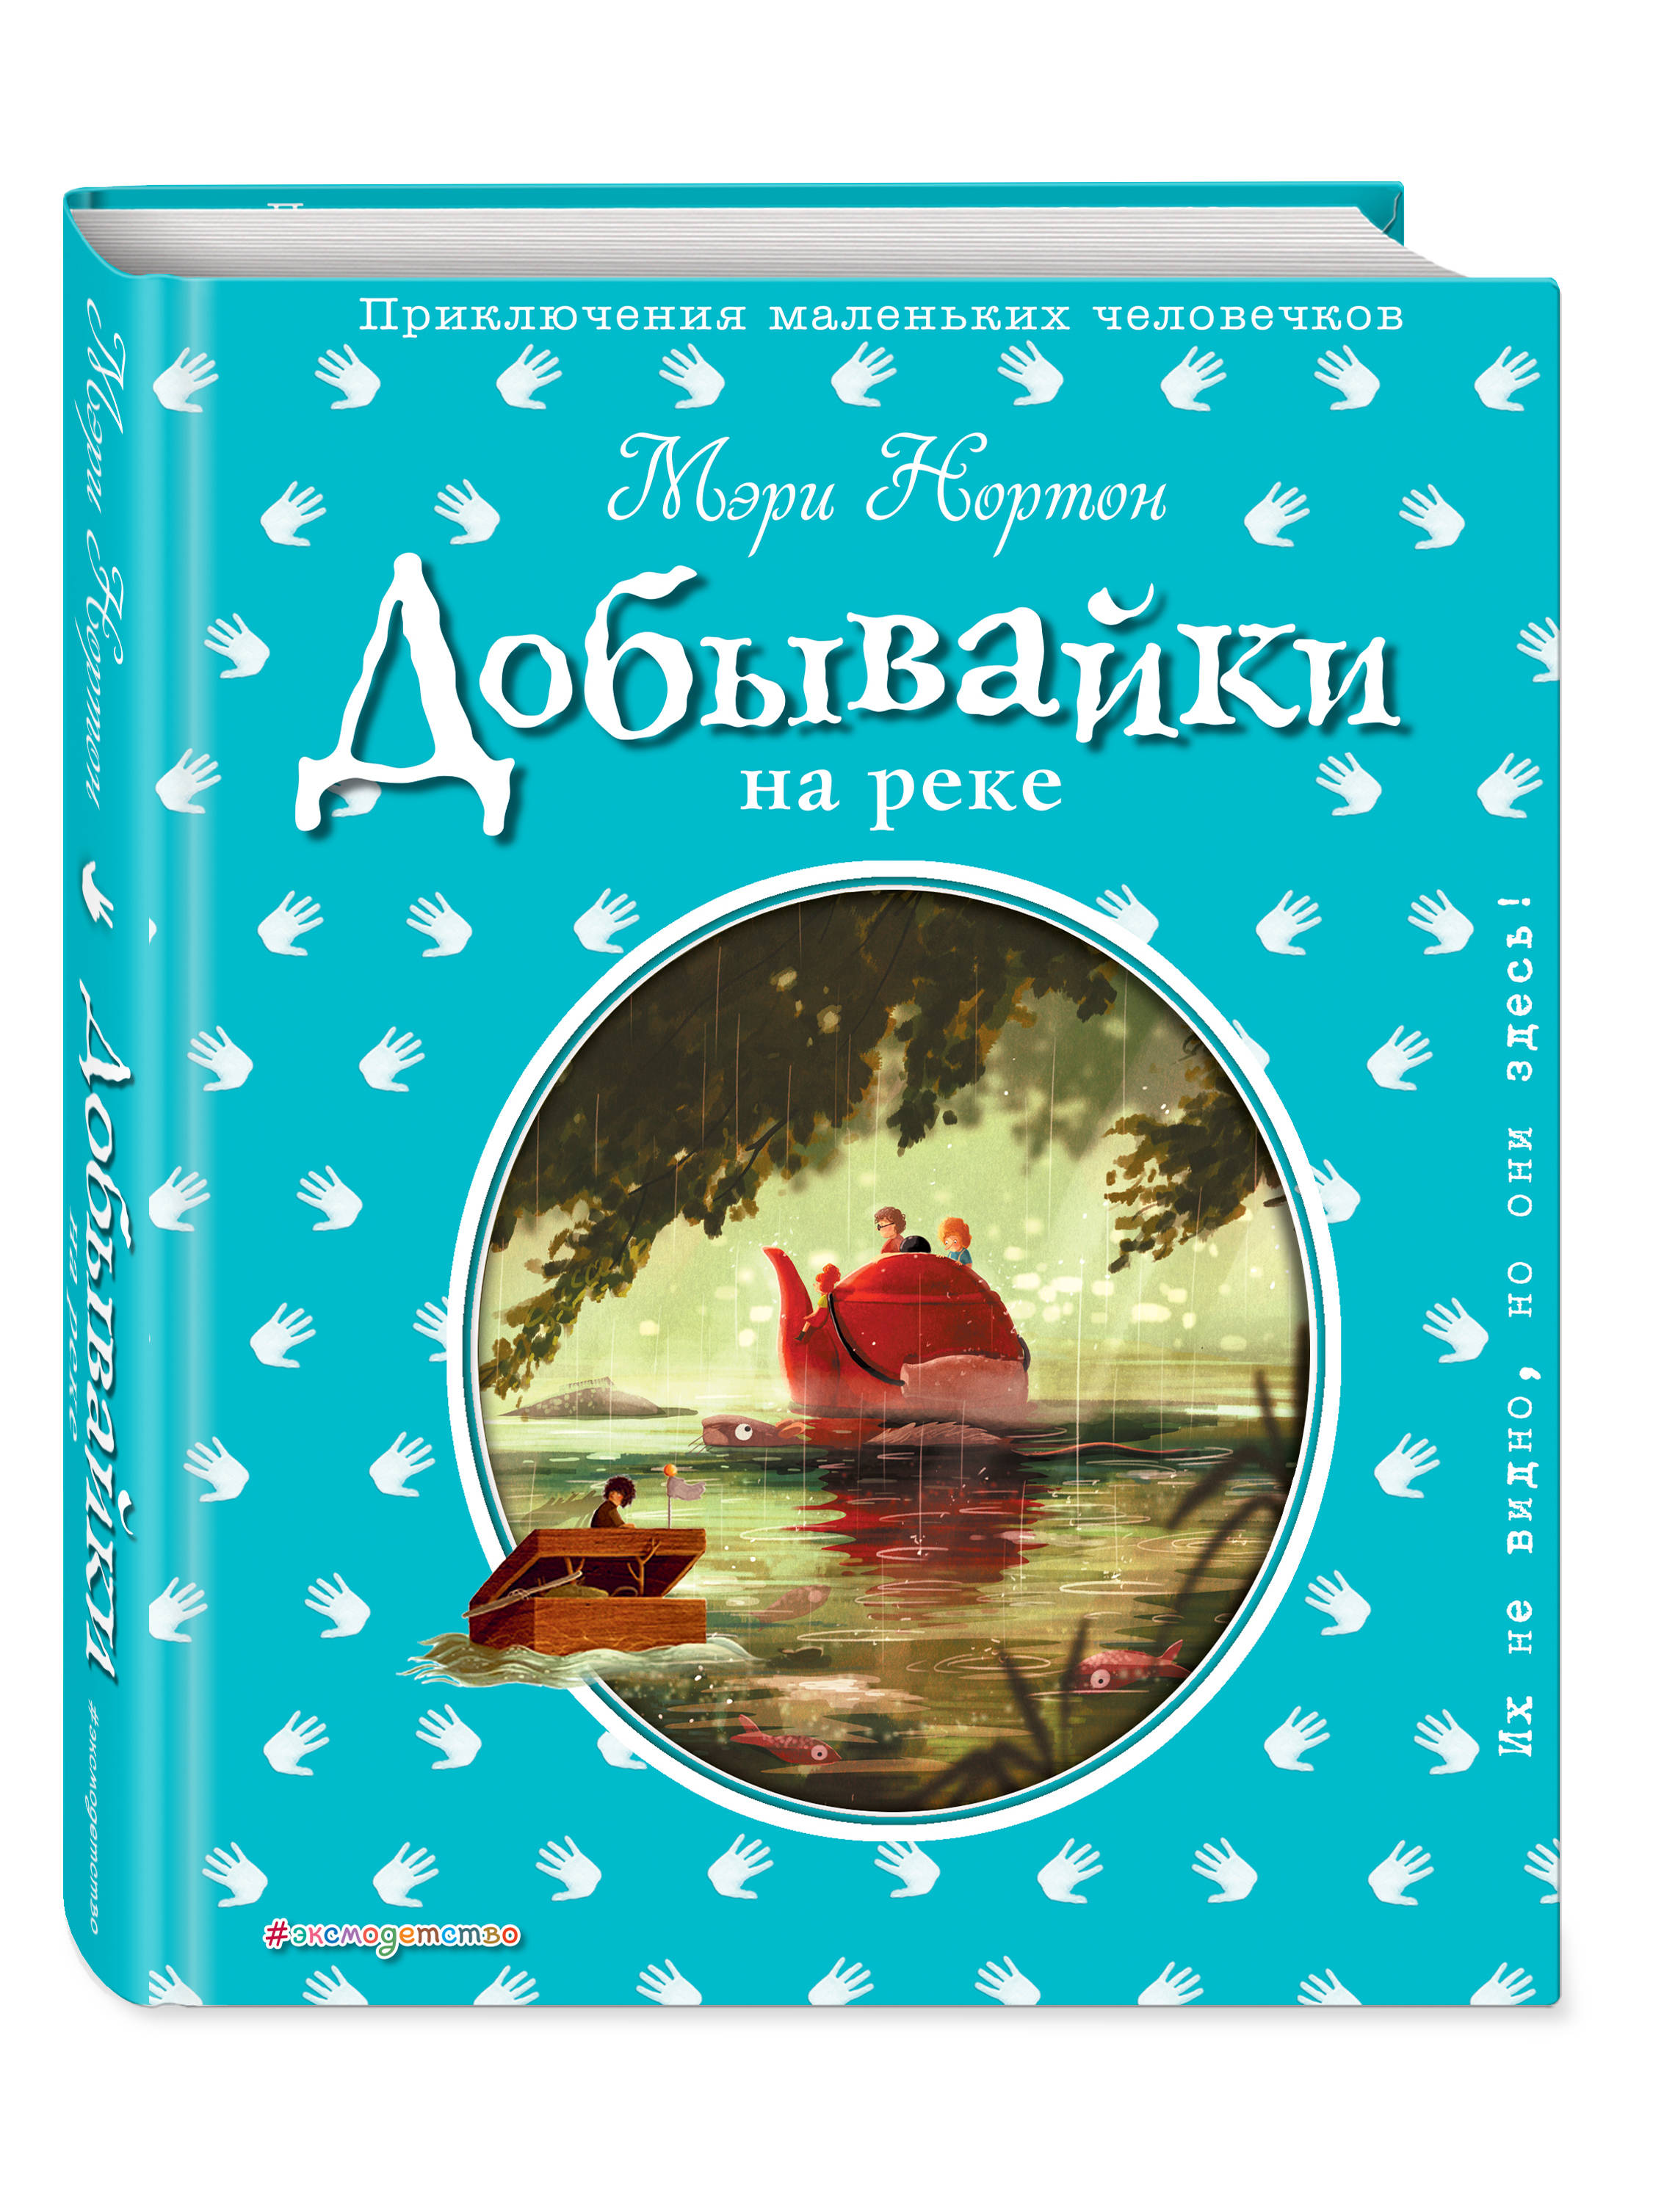 Нортон Мэри Добывайки на реке (ил. Э. Дзюбак) (#3)